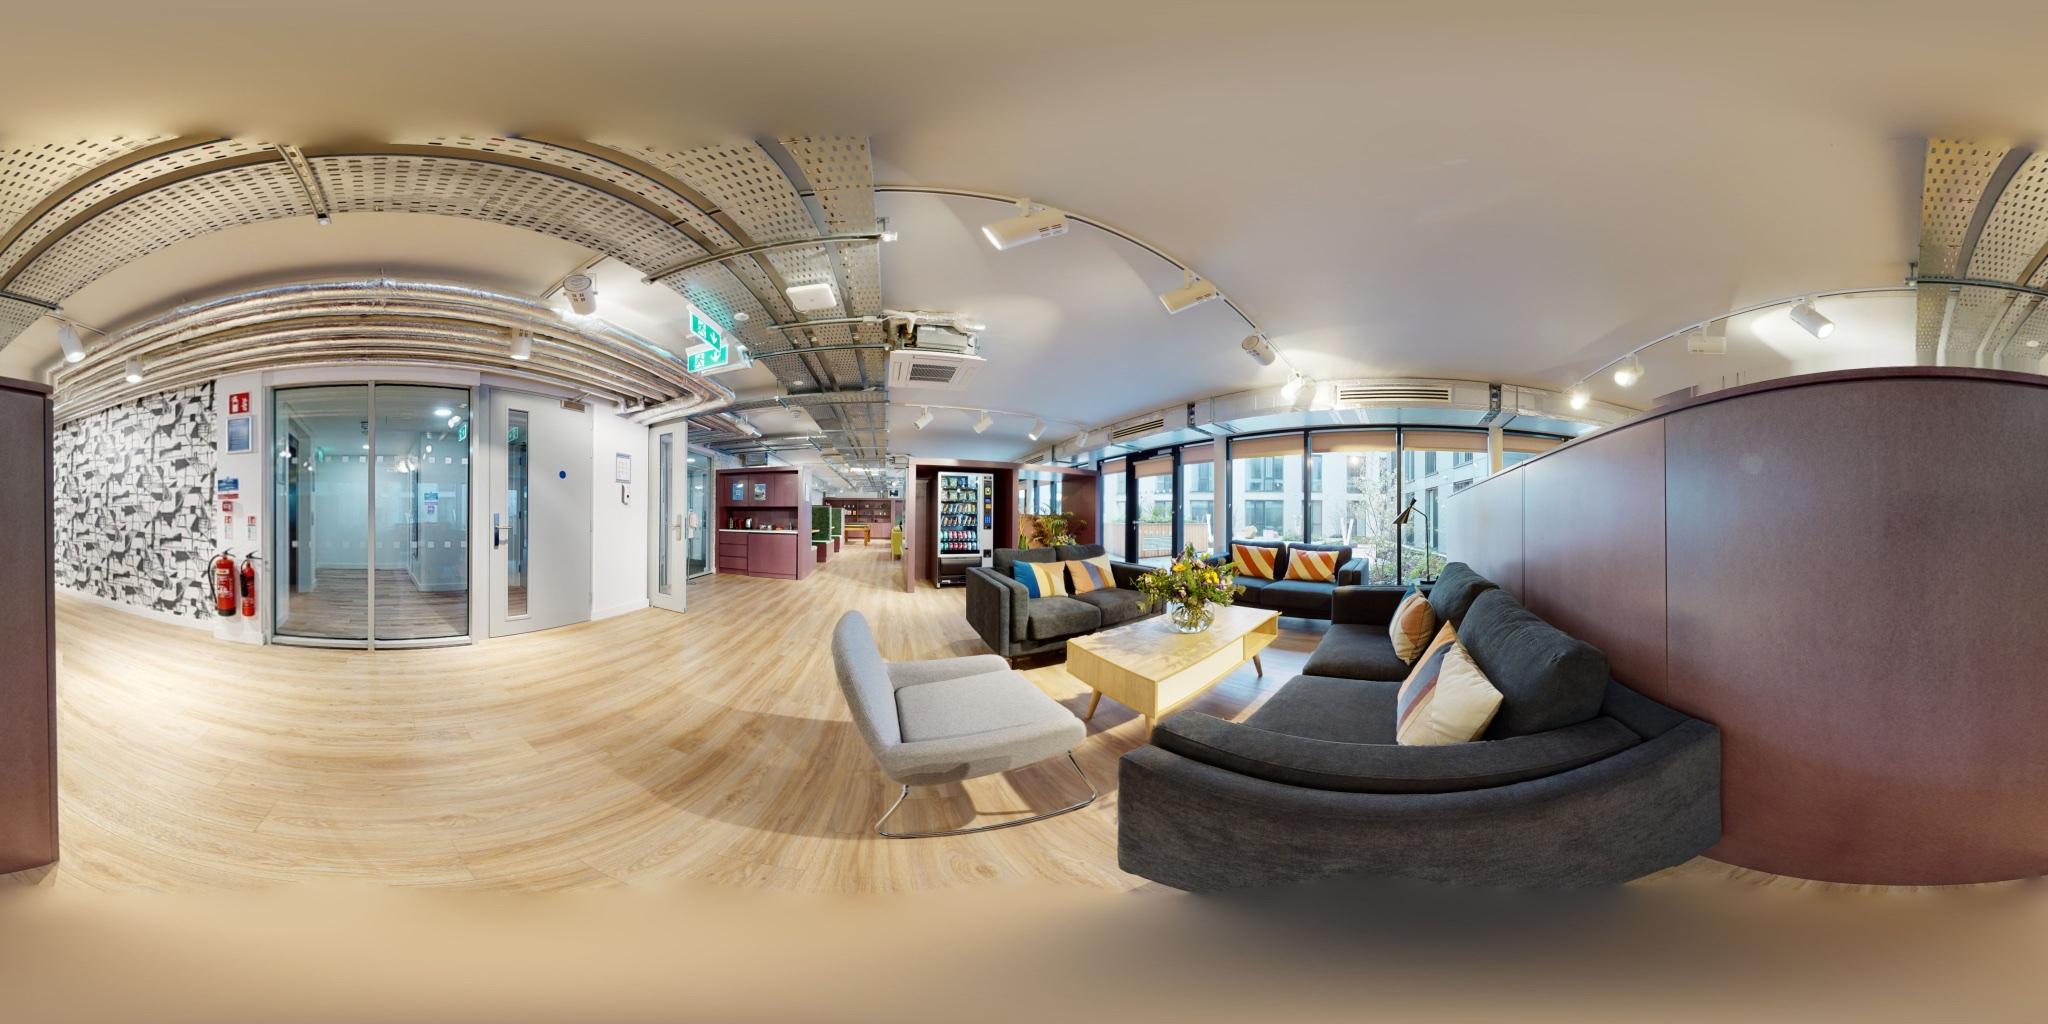 Student Accommodation 360° Matterport Virtual Tours Videographers in Dublin, Ireland